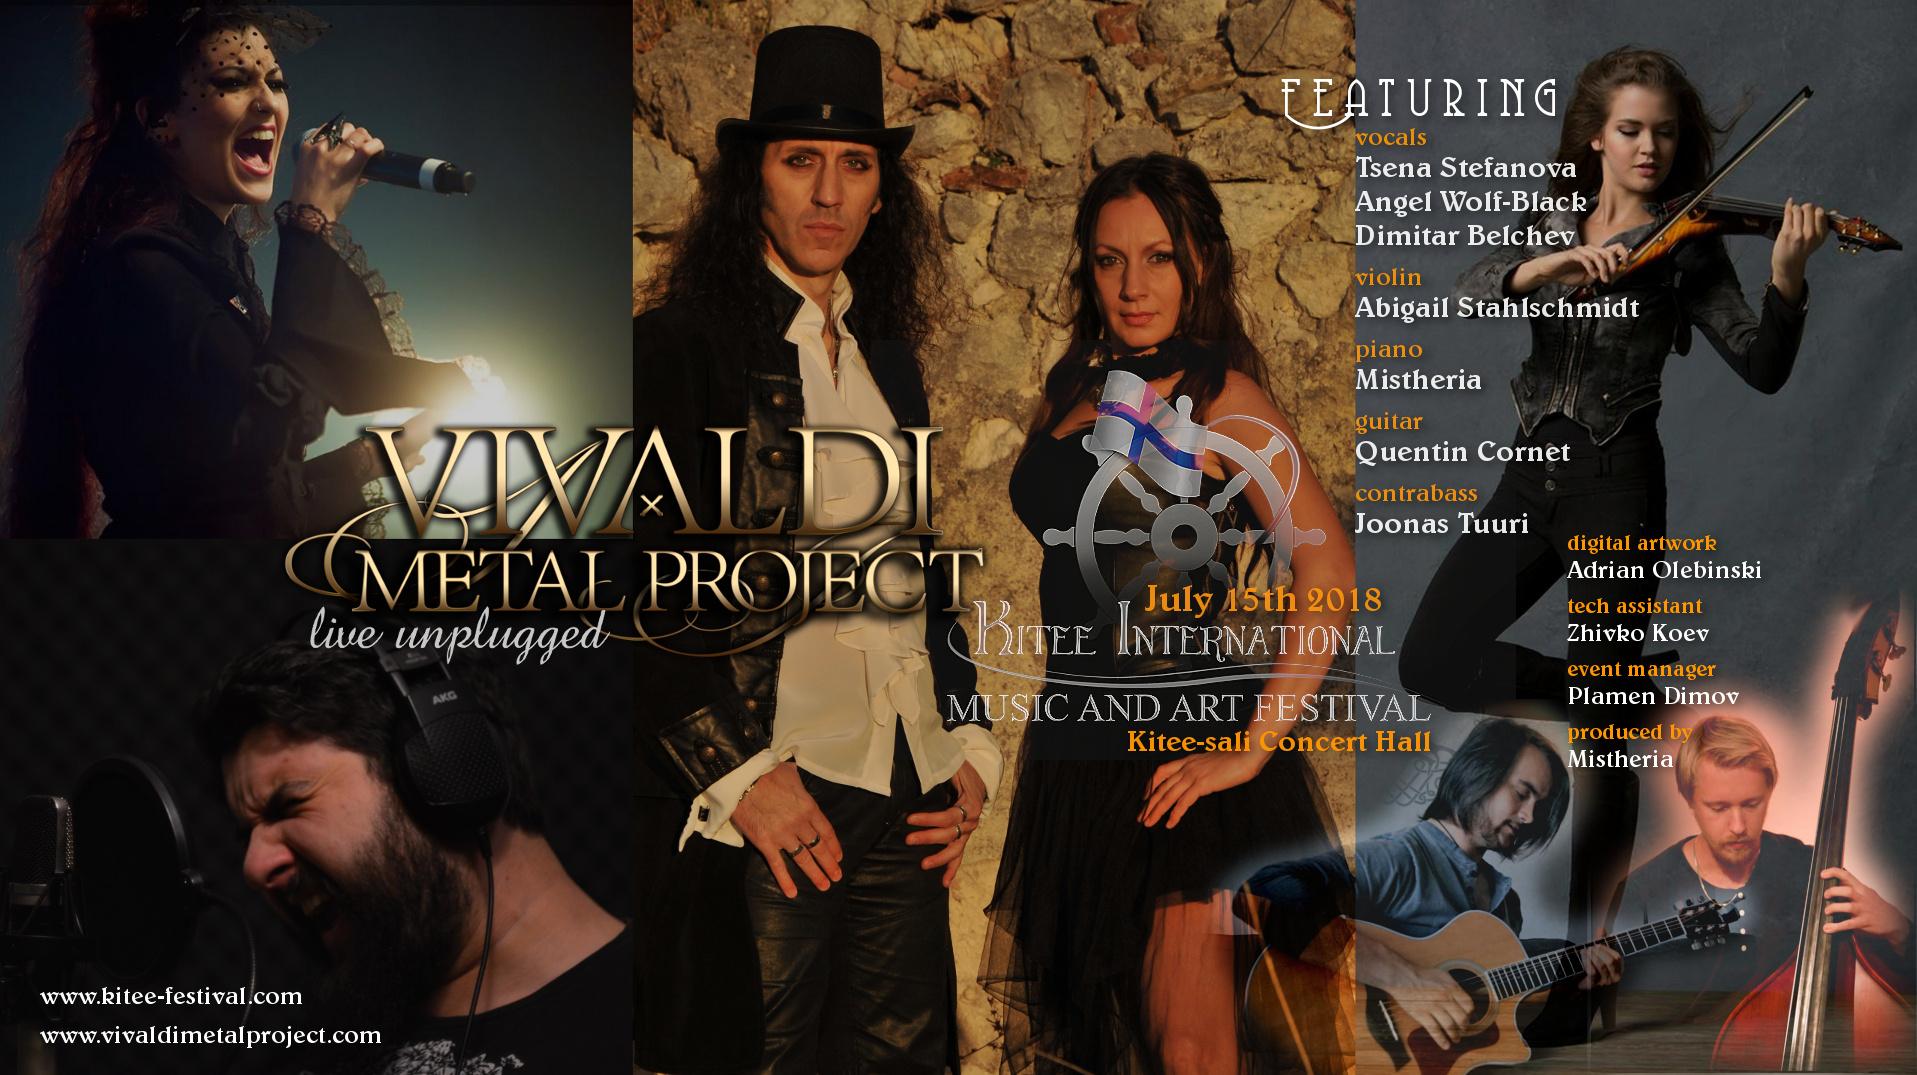 Vivaldi%20Metal%20Project%20unplugged%20